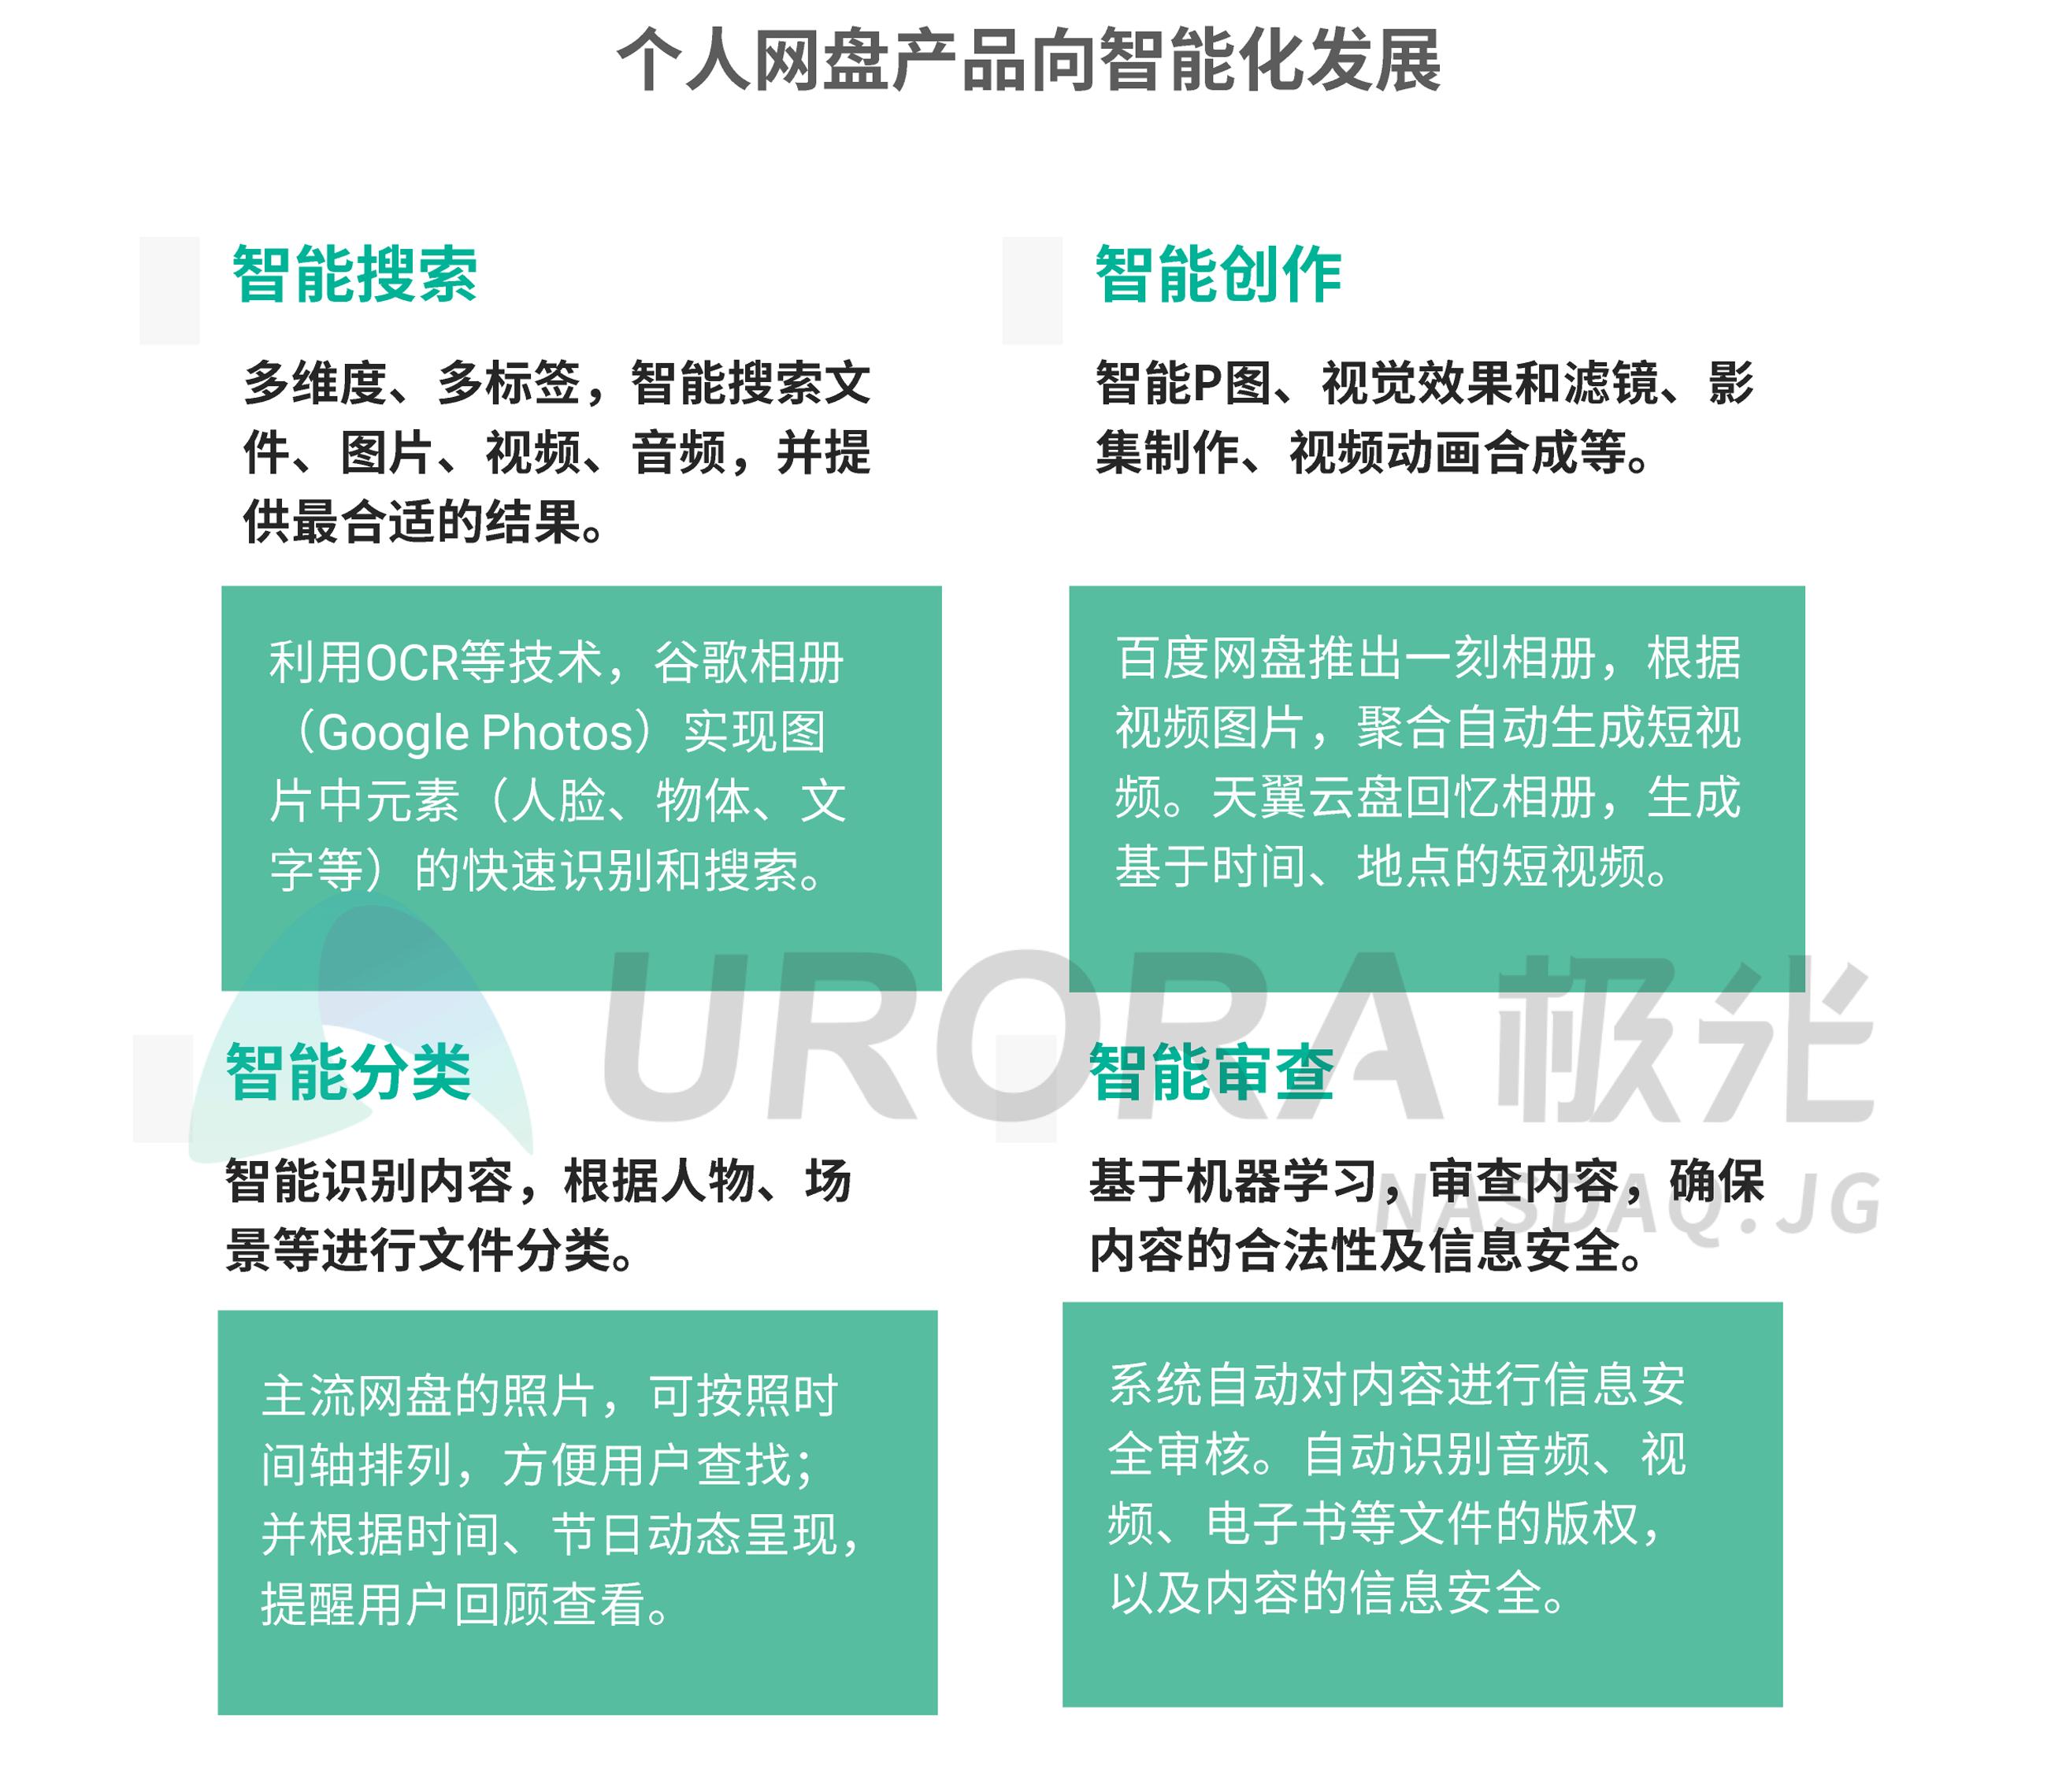 JIGUANG-个人网盘行业研究报告-final---切图版2-34.png